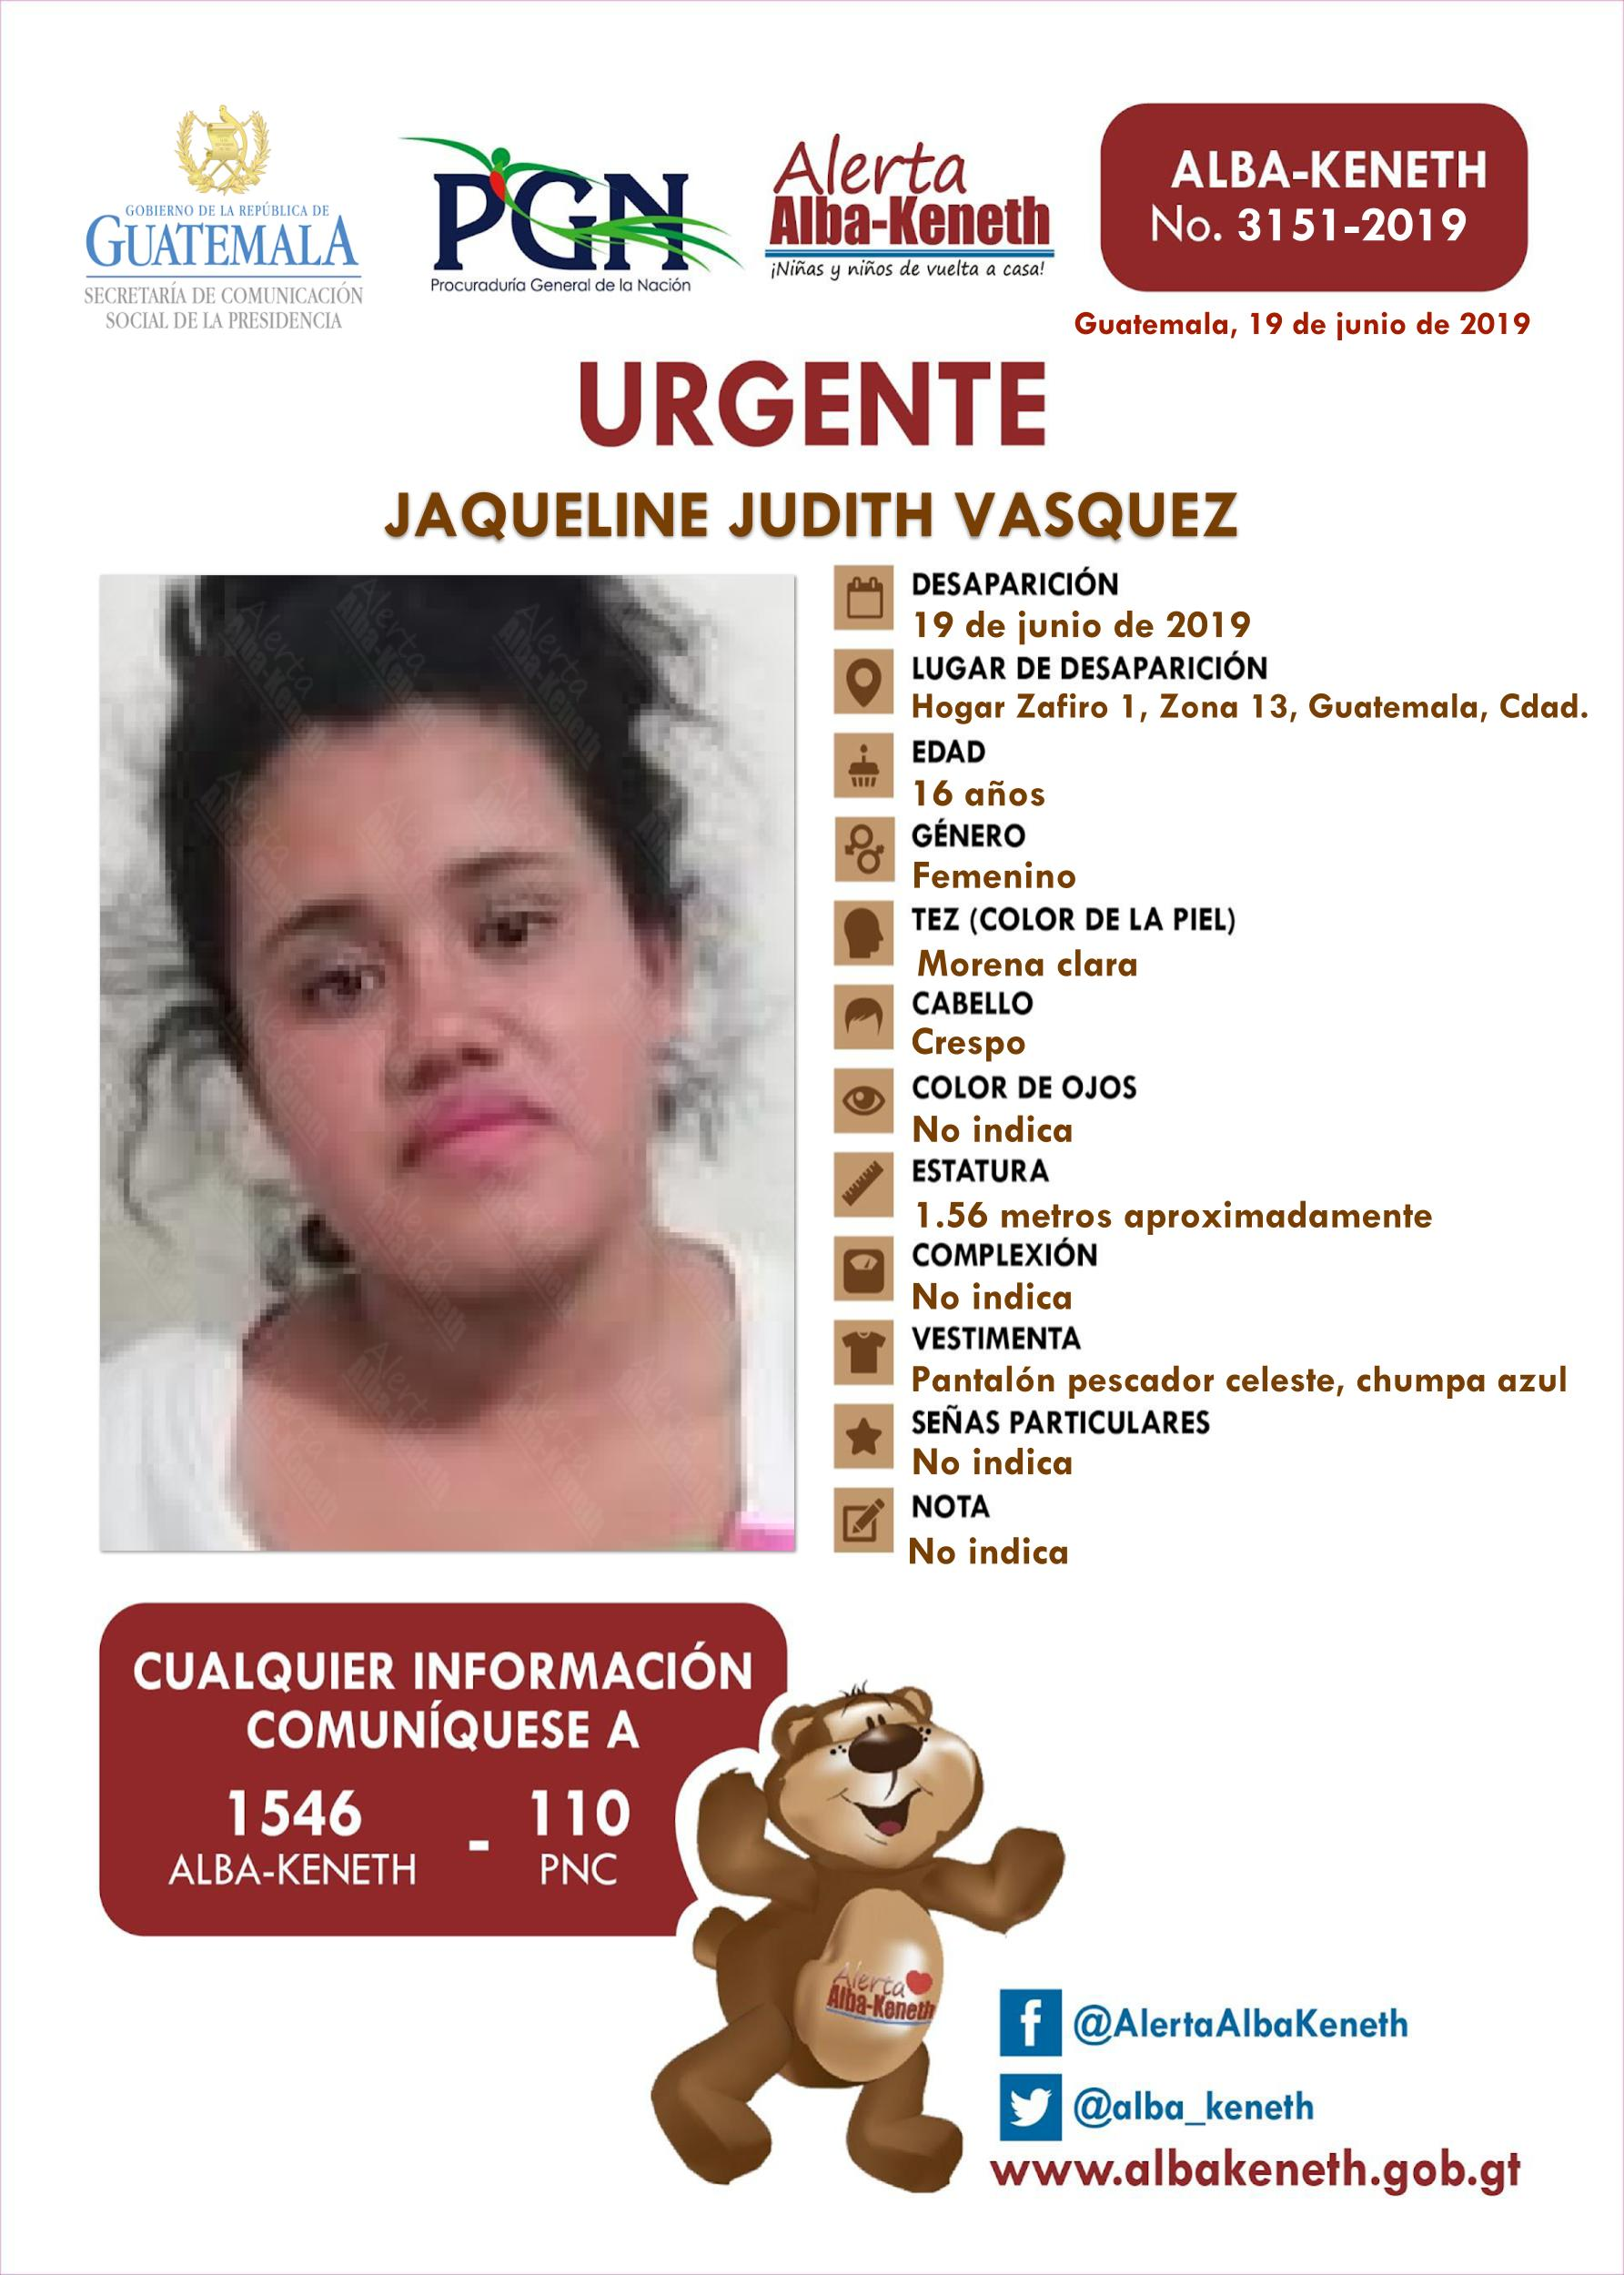 Jaqueline Judith Vasquez